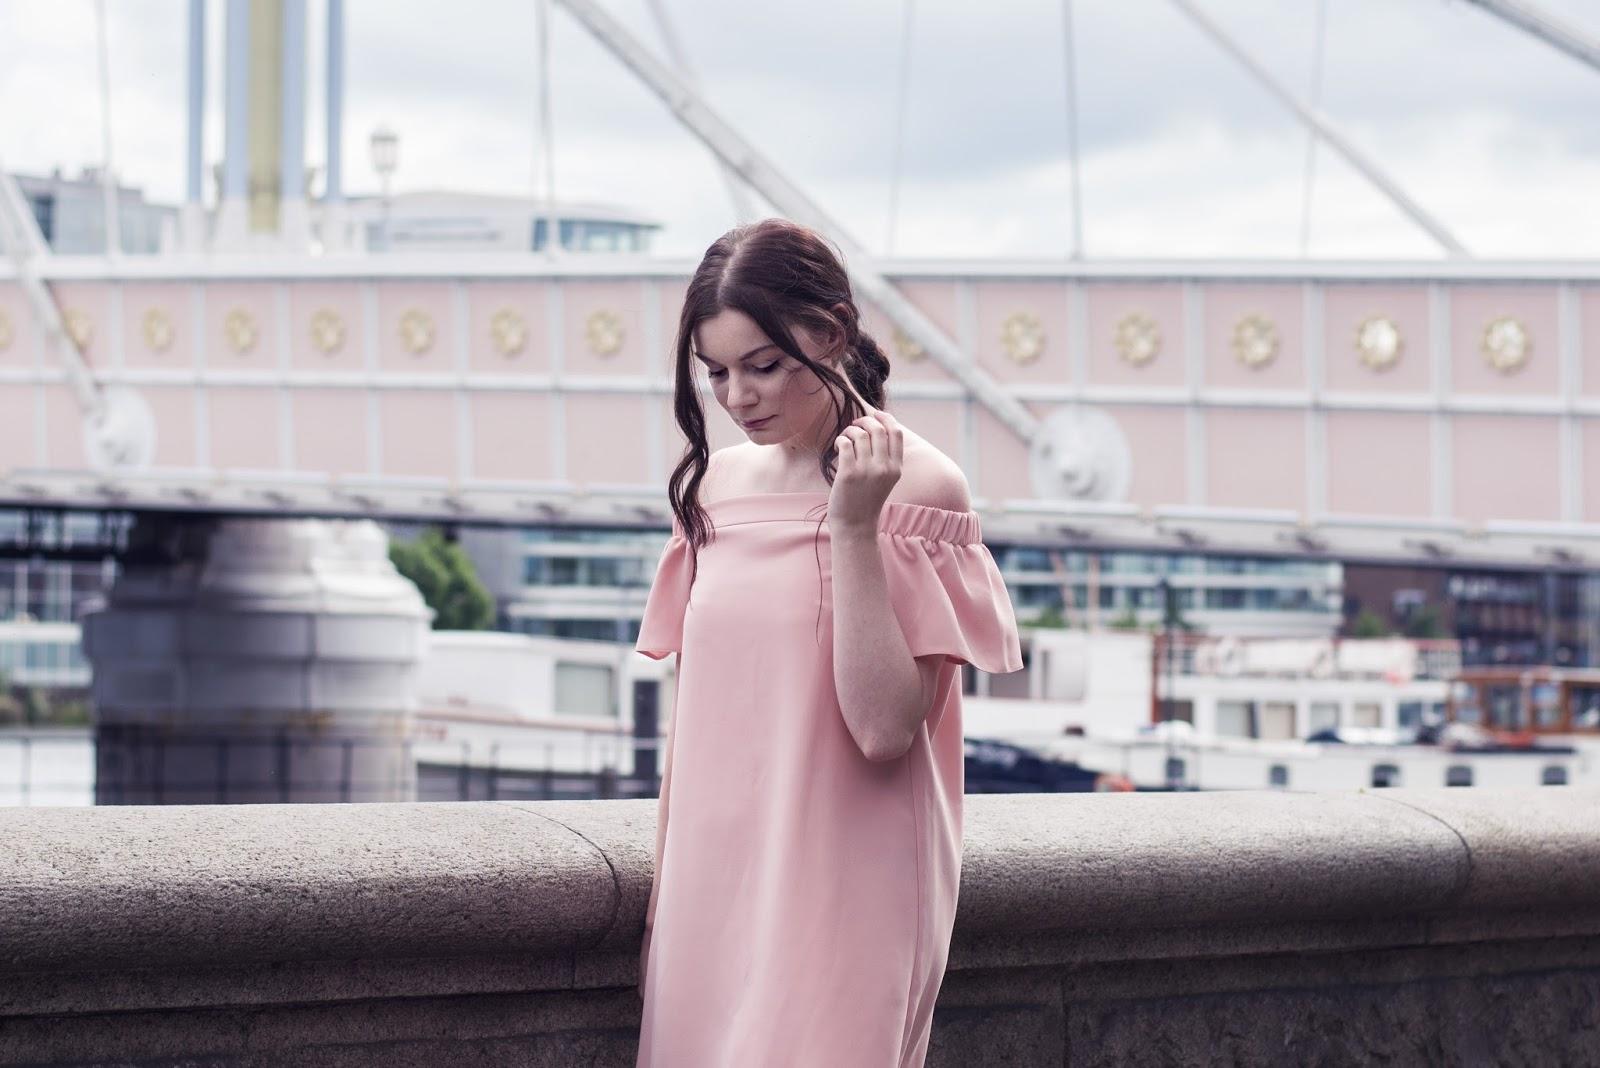 Pink Topshop Bardot Dress and Nike Air Force 1 | Albert Bridge Chelsea London | Rose Kiara Peaches